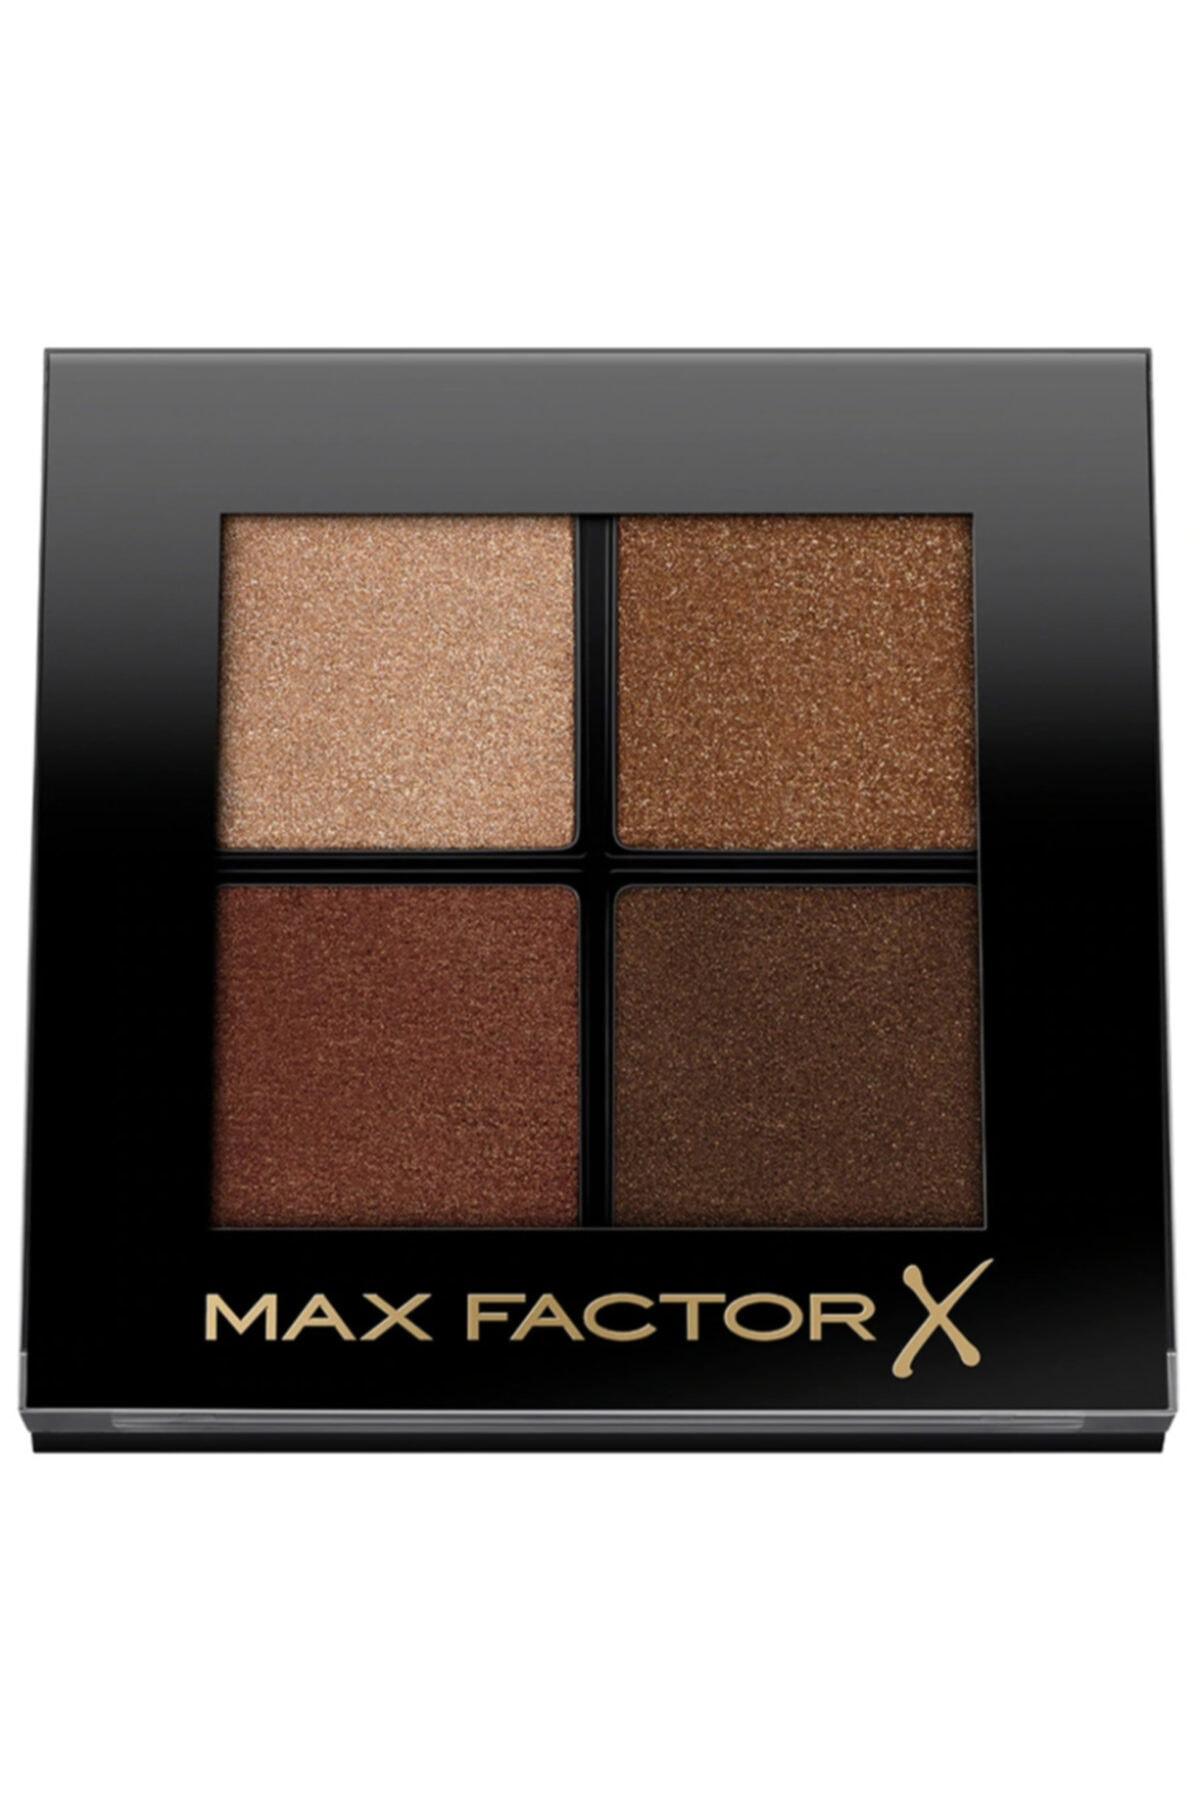 Max Factor Color X-pert Soft Touch Palette Bronze Göz Farı Paleti 04 Veiled 1